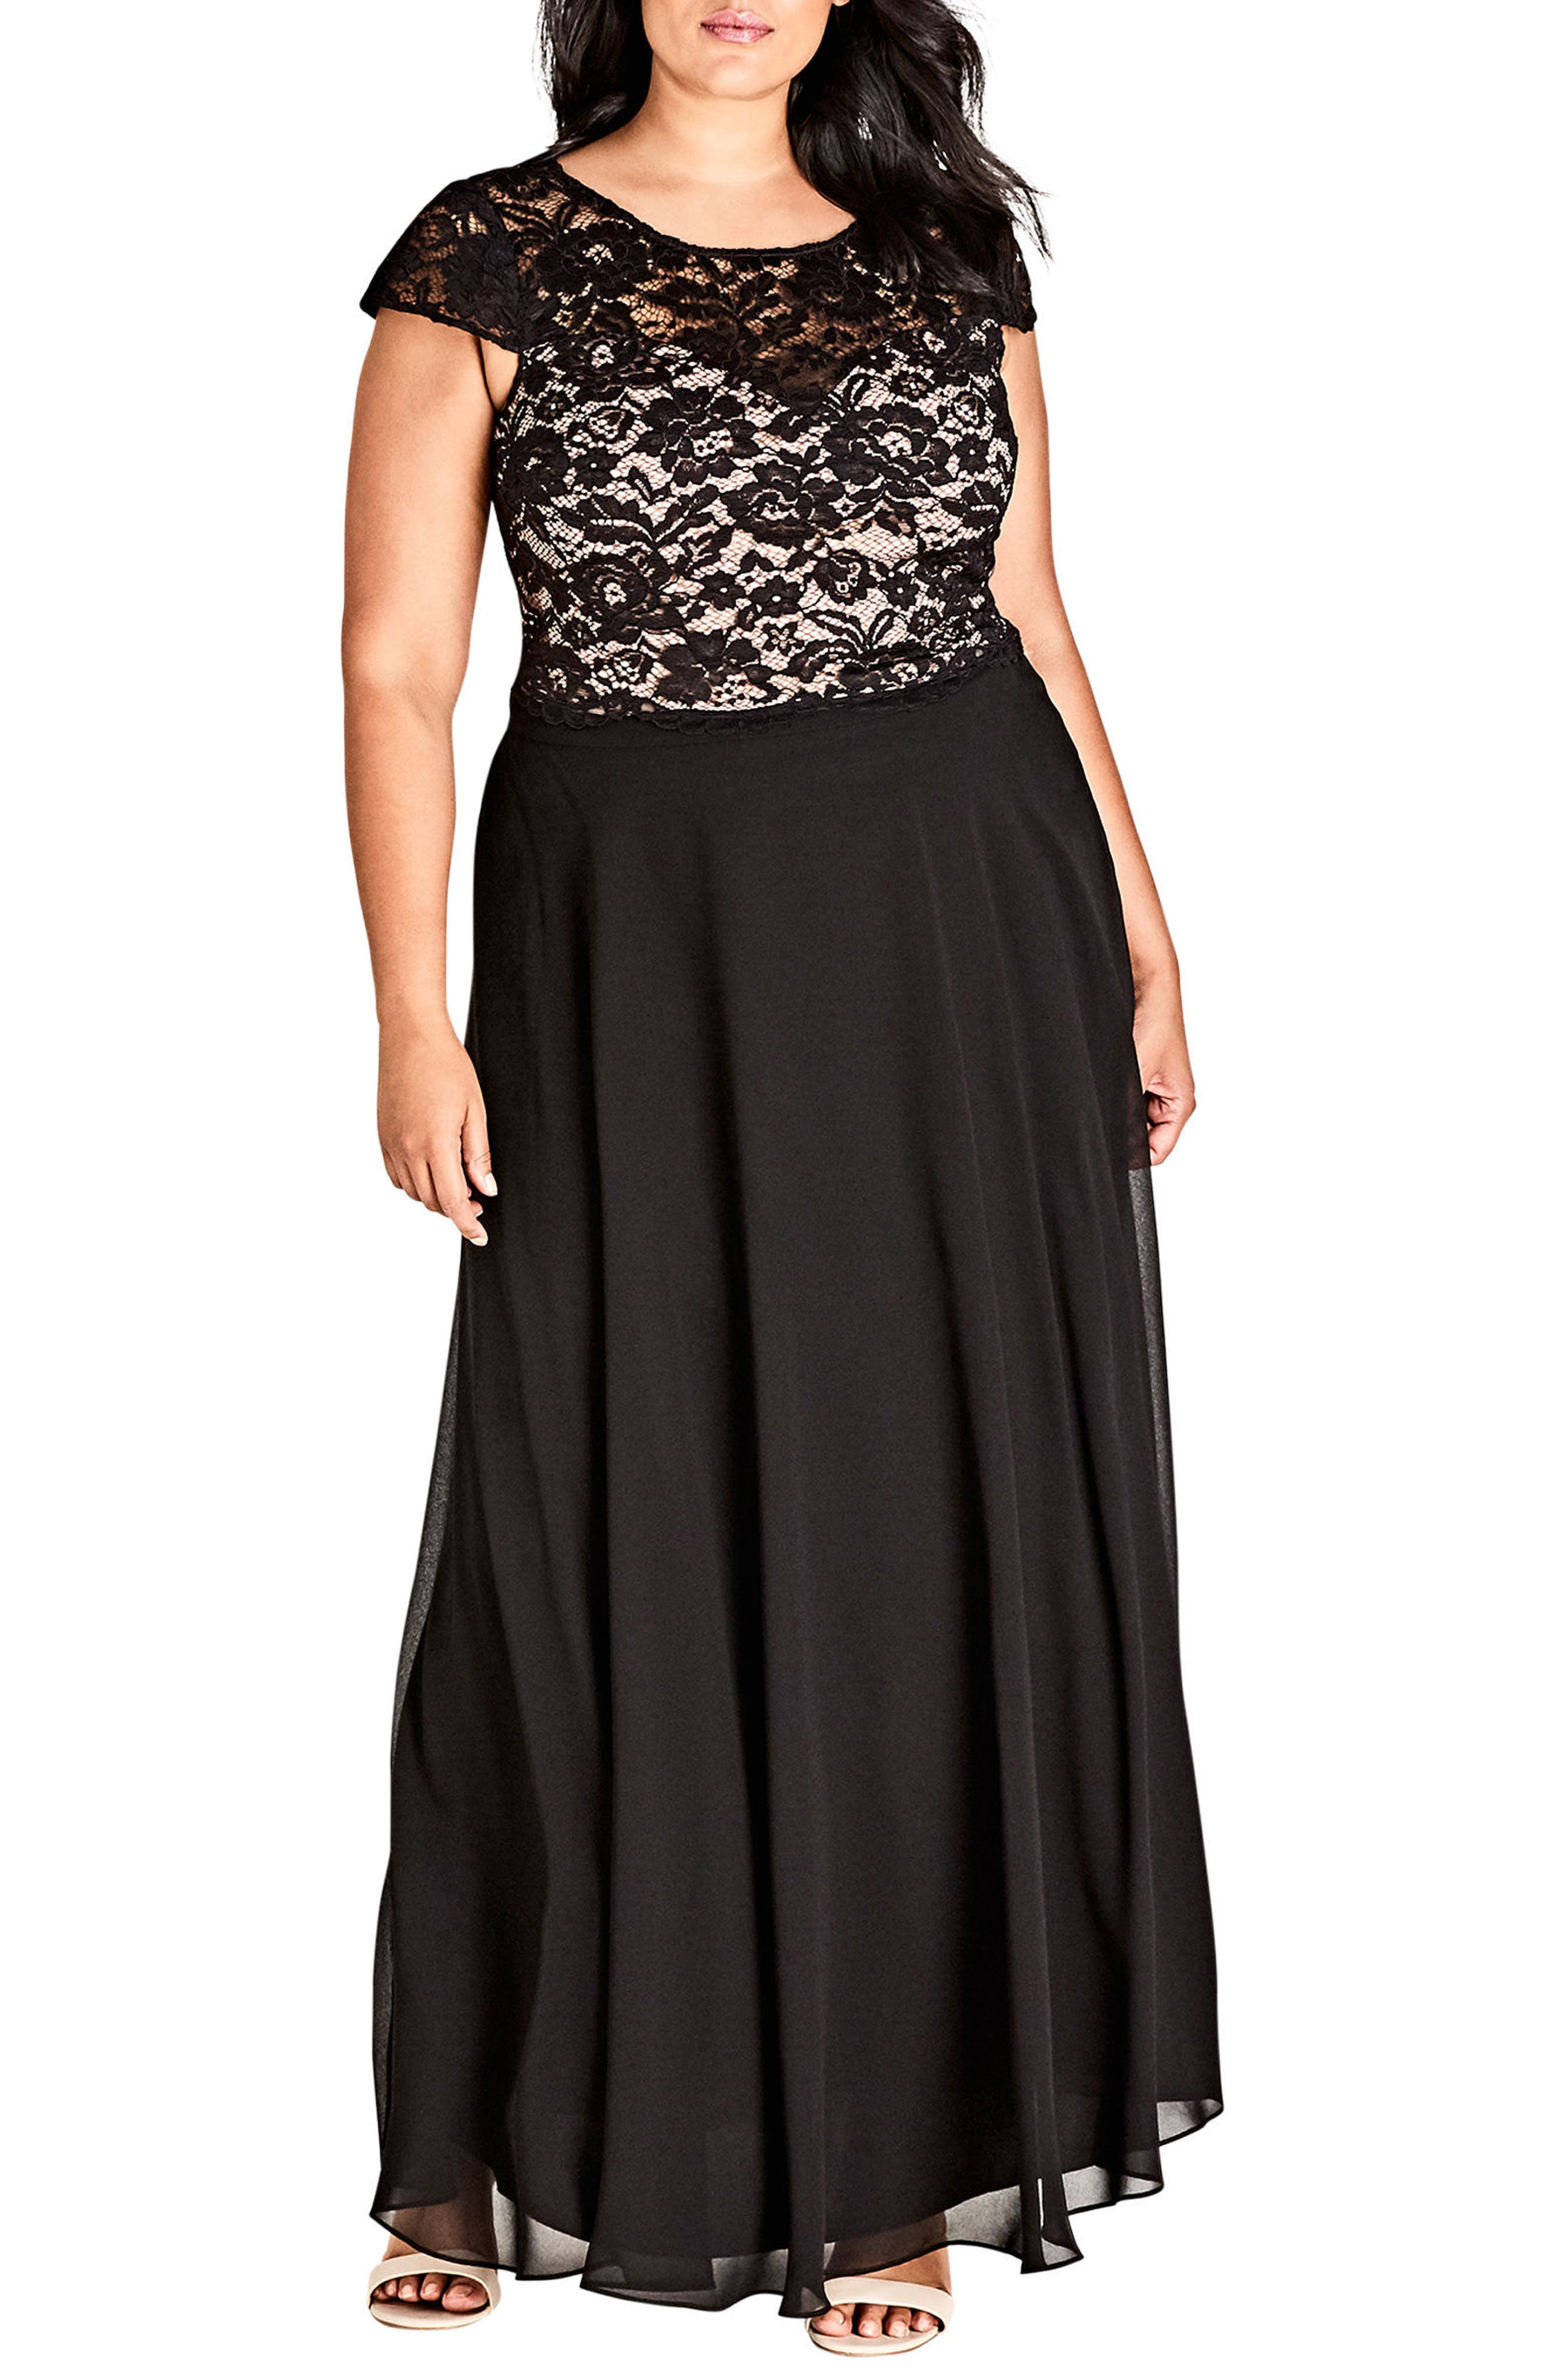 Black Plus Size Formal Dresses